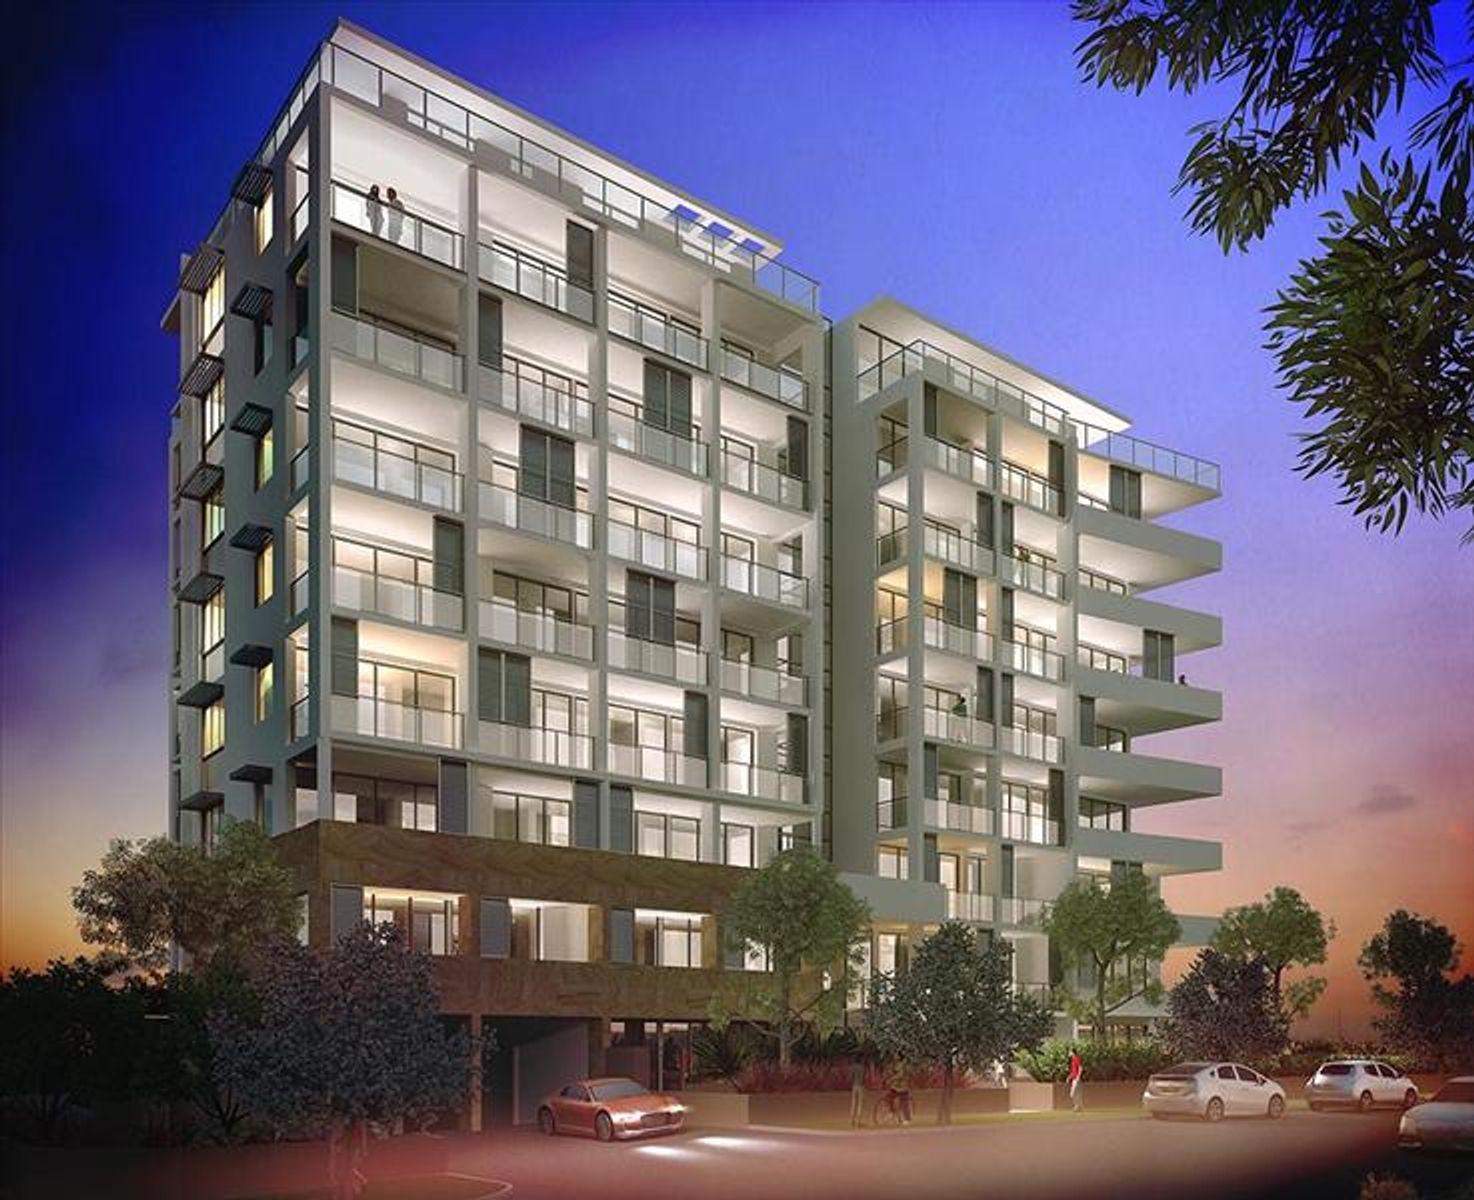 108/33 Devonshire Street, Chatswood, NSW 2067